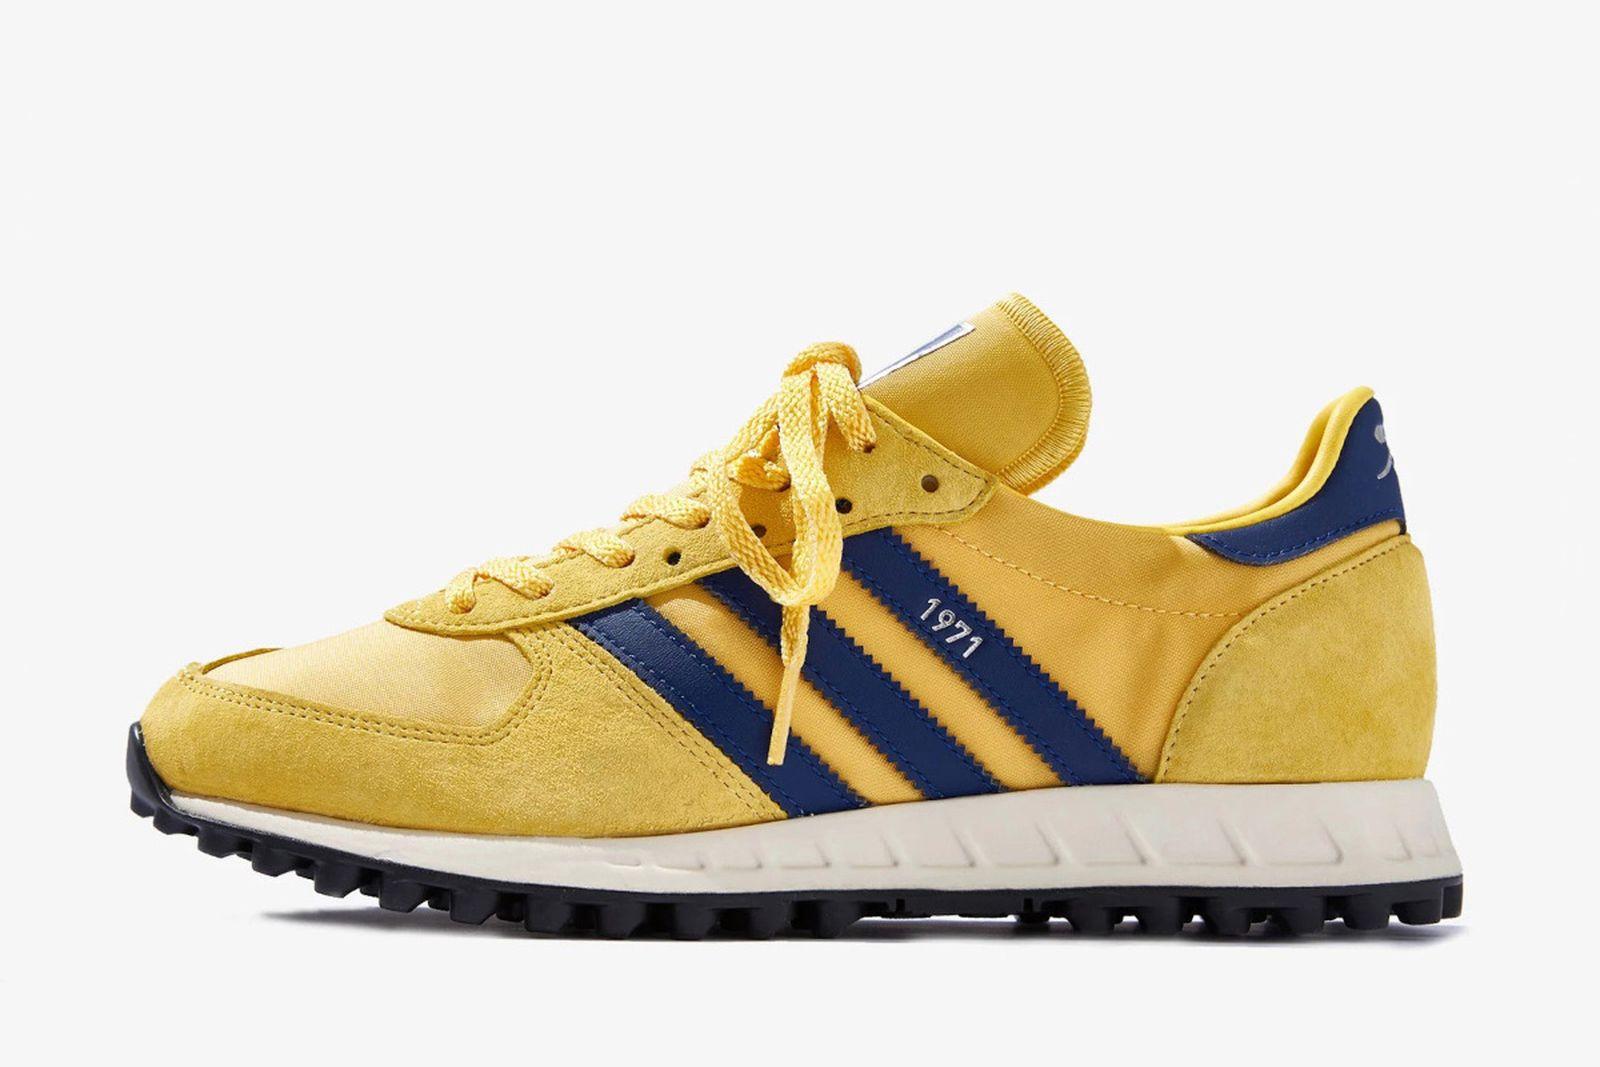 arsenal-adidas-trx-runner-02